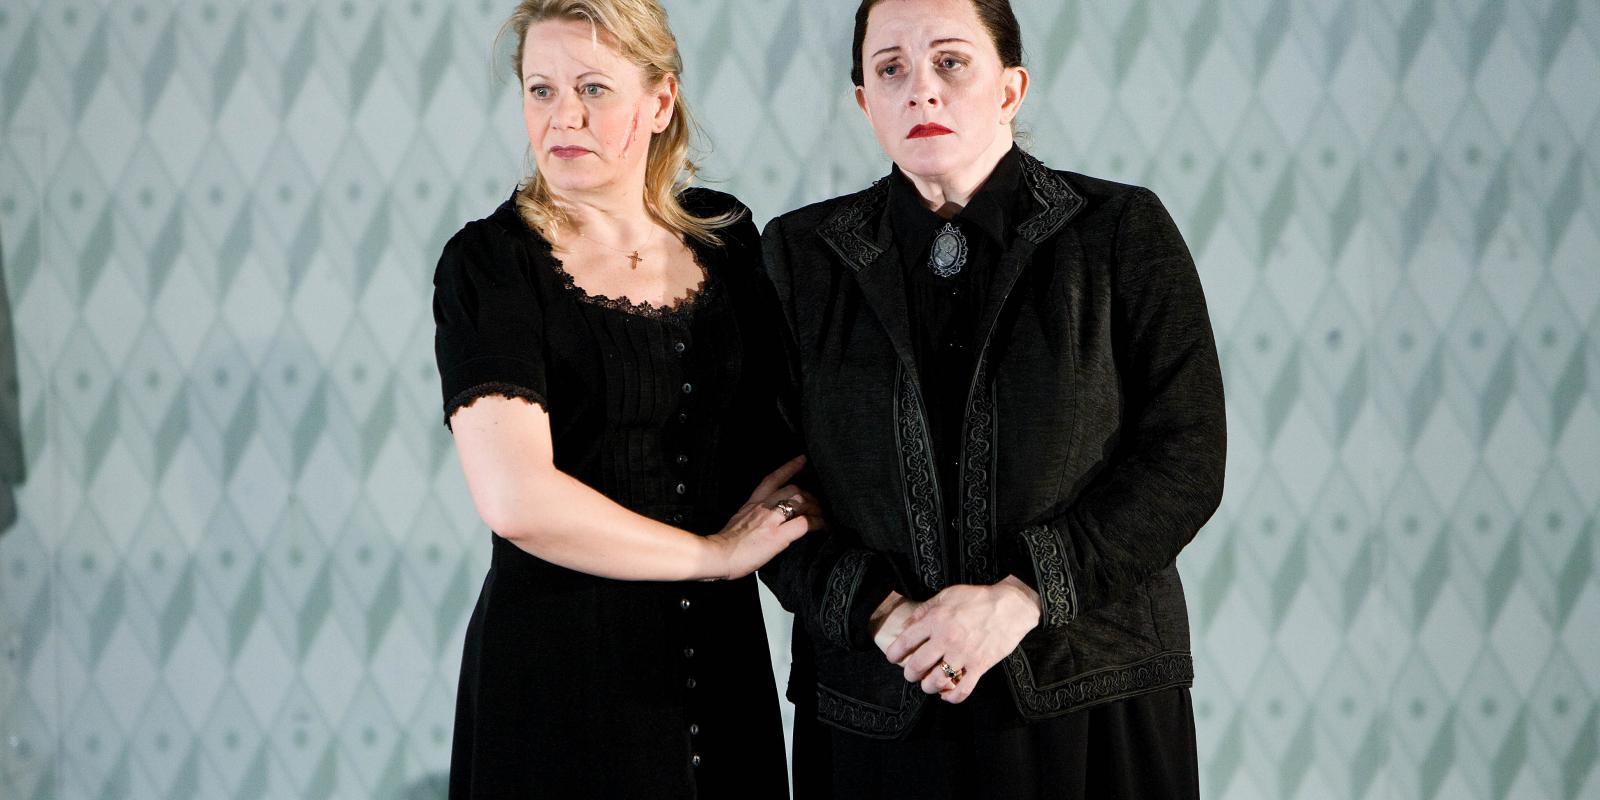 two women in grieving close interlocking arms in Jenufa